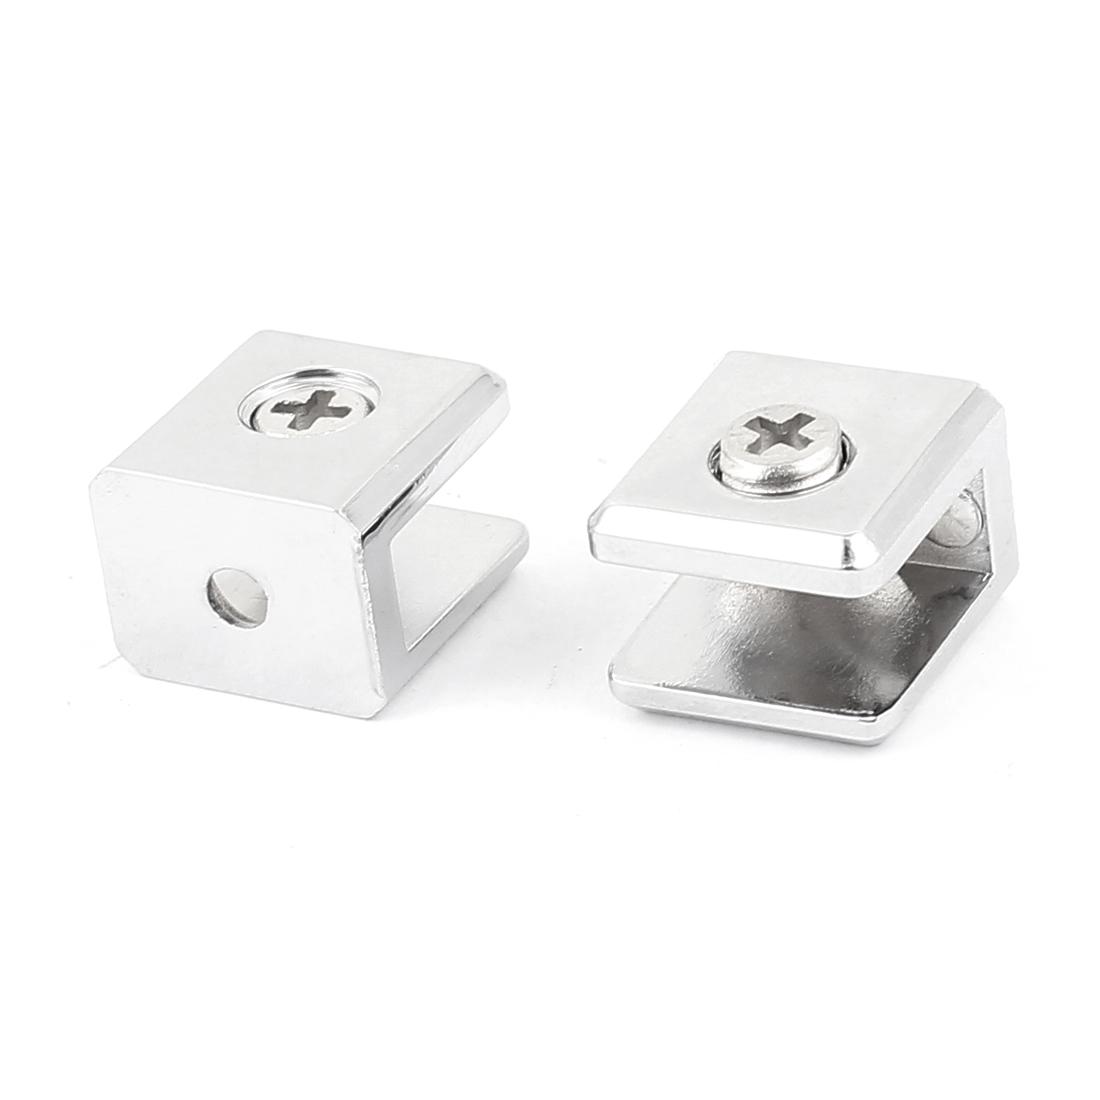 5mm-7mm Adjustable Cabinet Glass Rectangle Clip Clamps Bracket Holder 2pcs